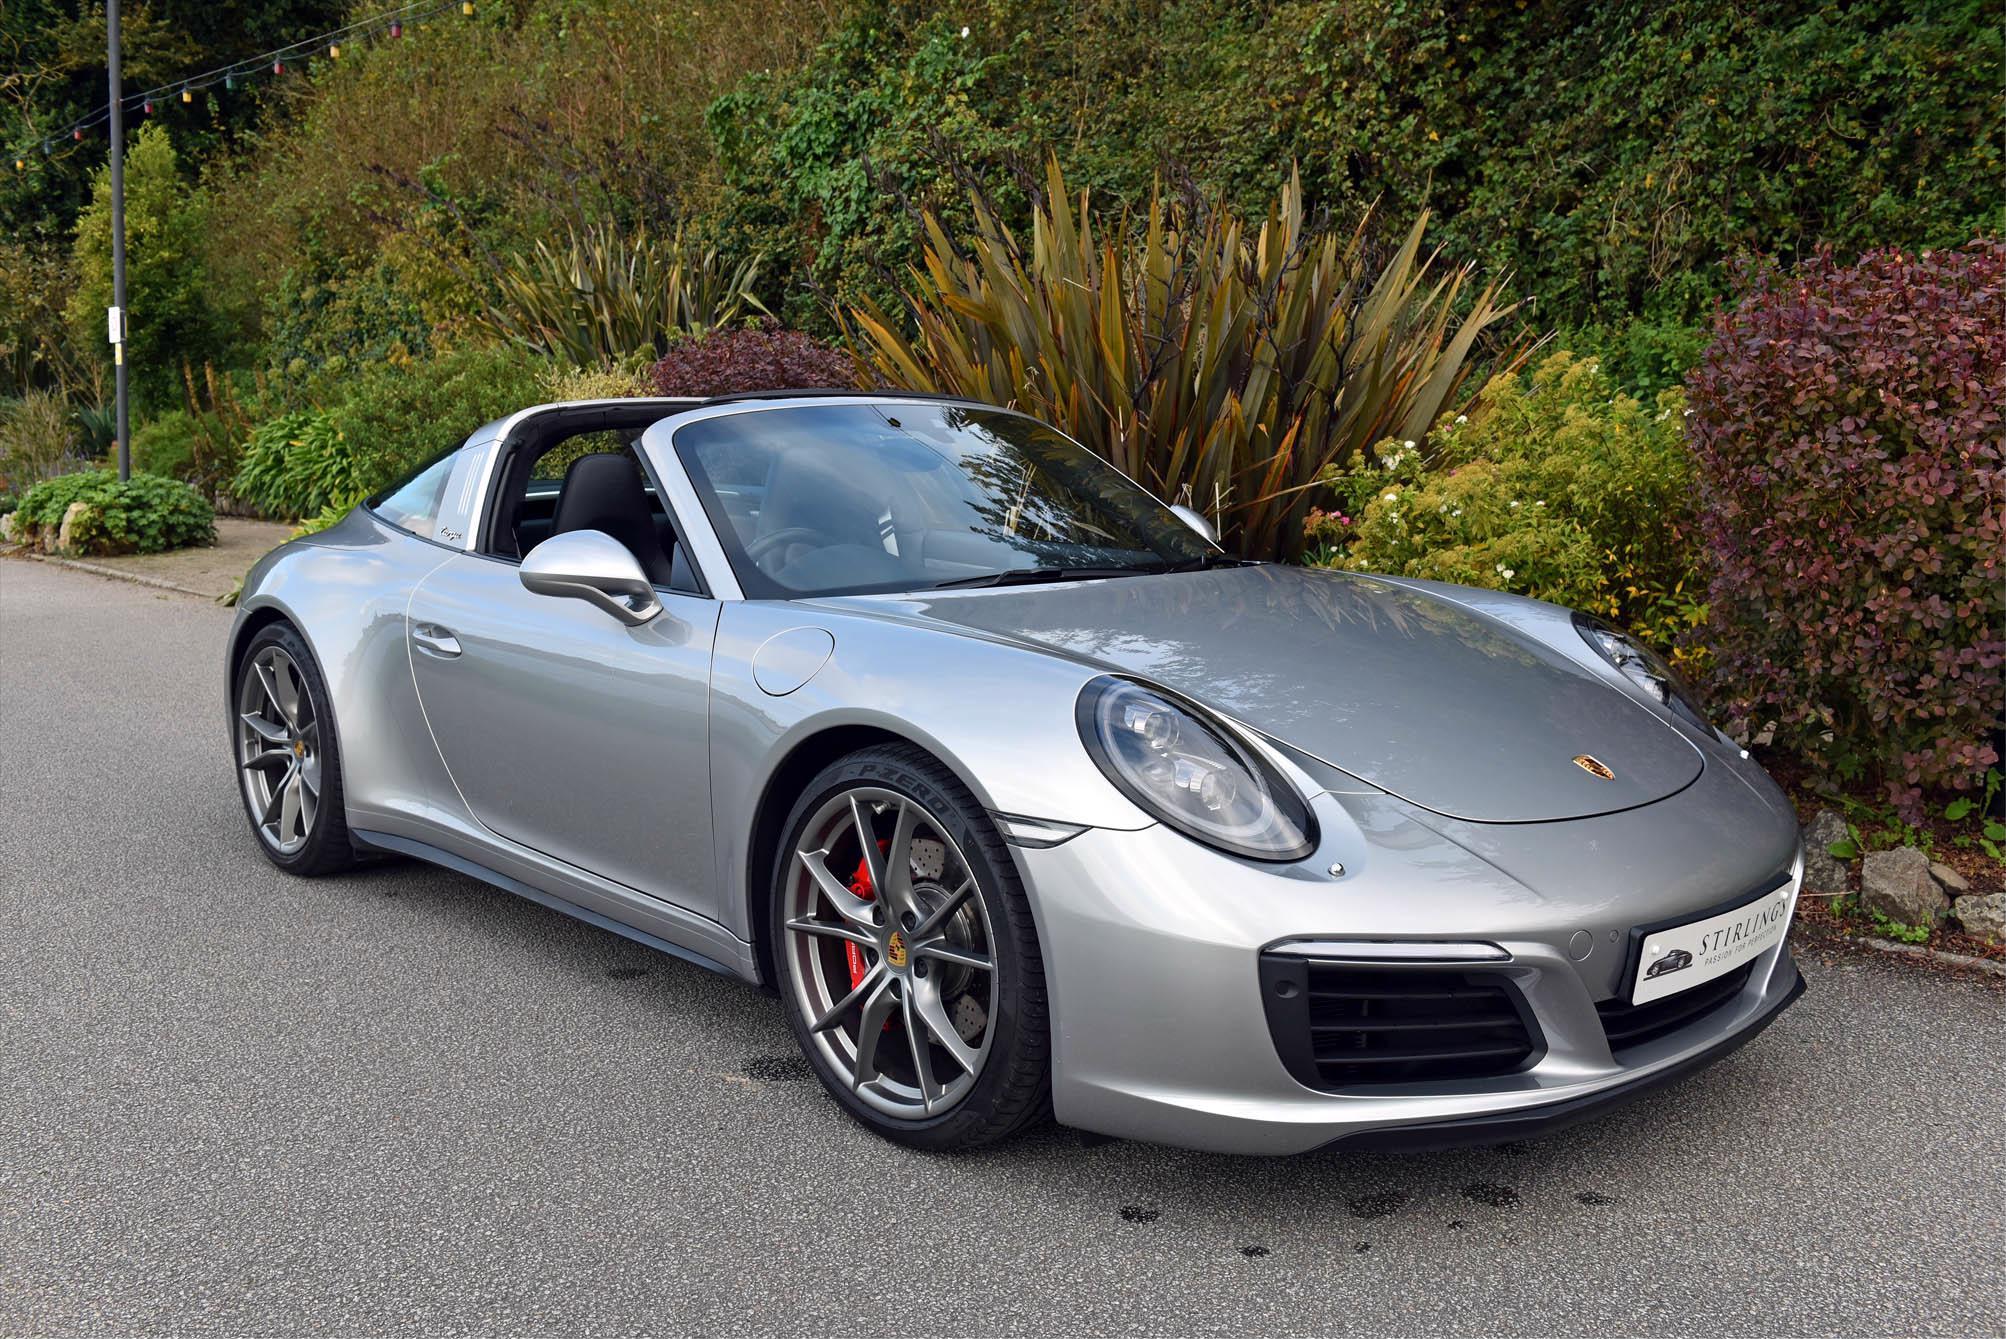 2016 Porsche 911 991 Targa 4s Pdk Gen 2 For Sale Stirlings